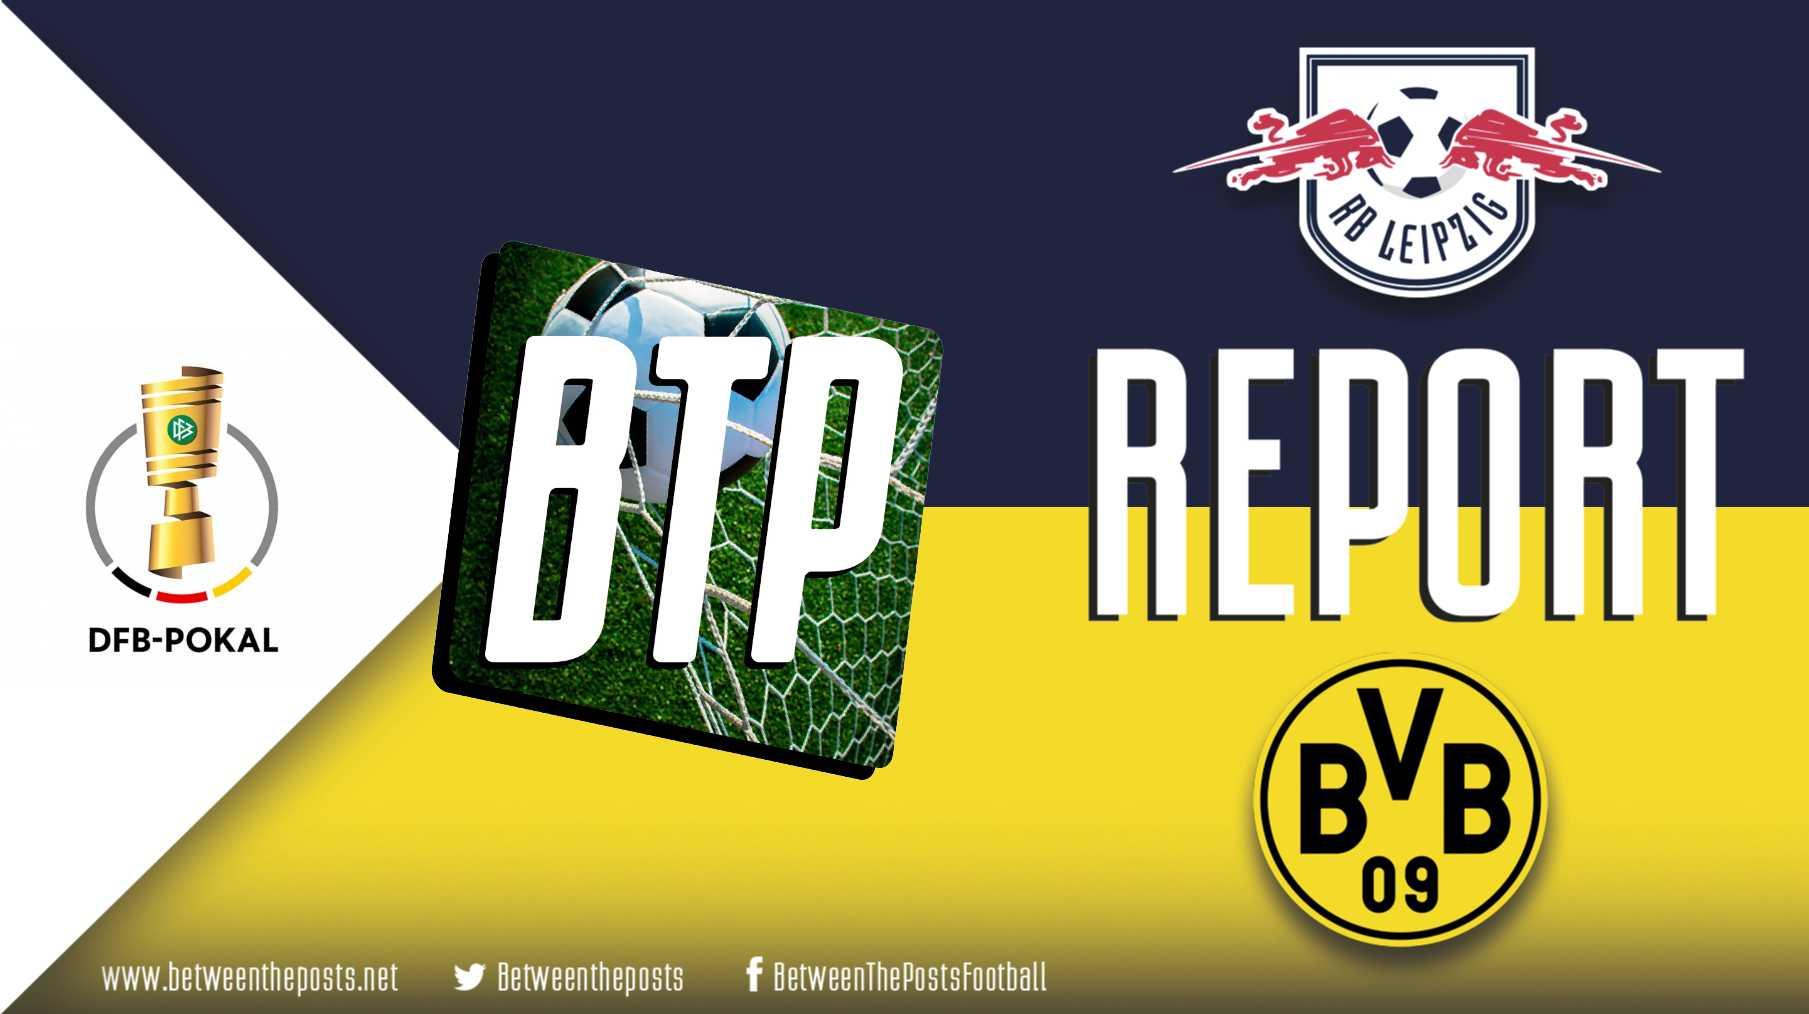 RB Leipzig Borussia Dortmund 1-4 DFB Pokal Final